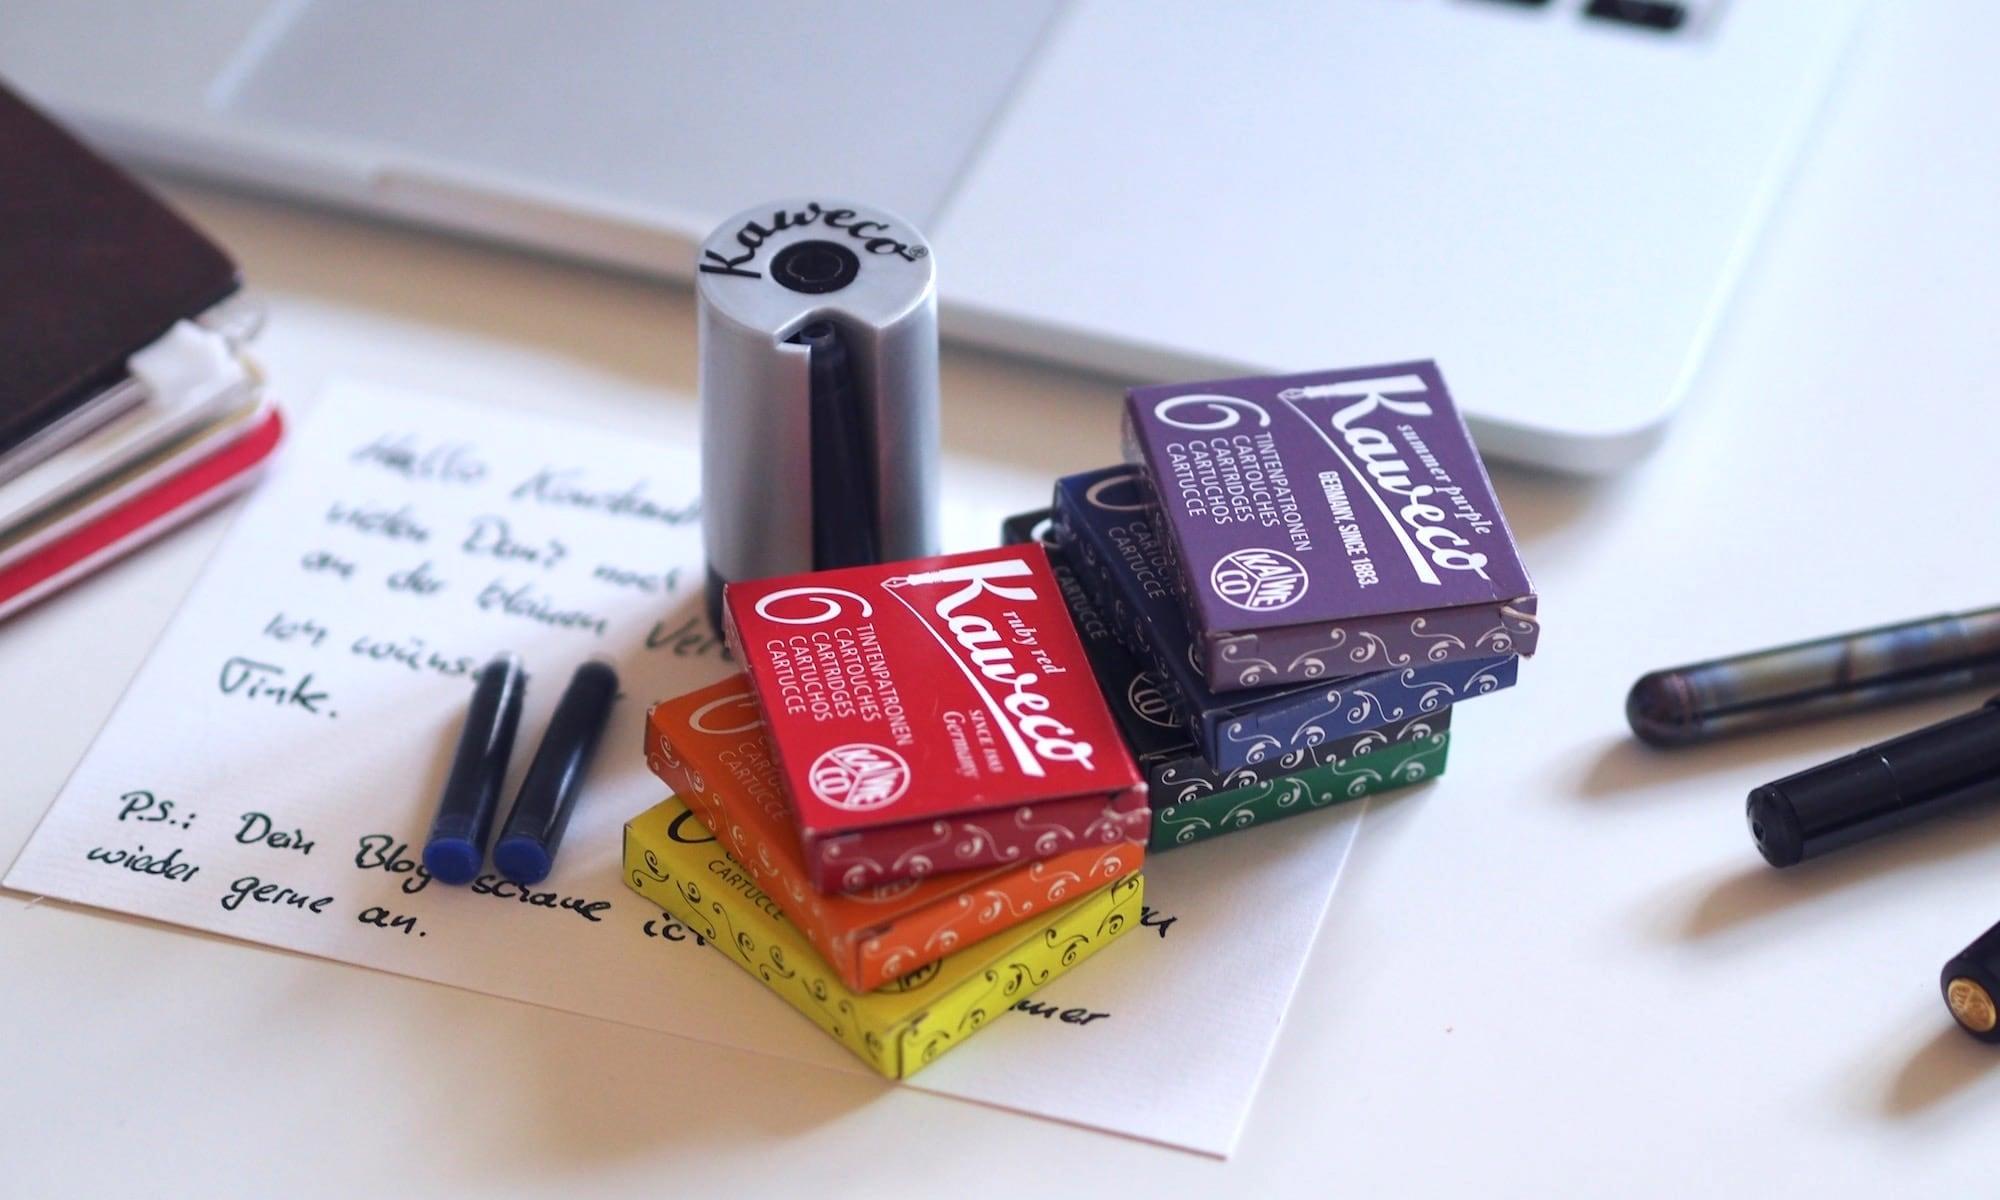 Ein Kaweco Tintenpatronen-Set als Überraschung | Foto: konsensor.de